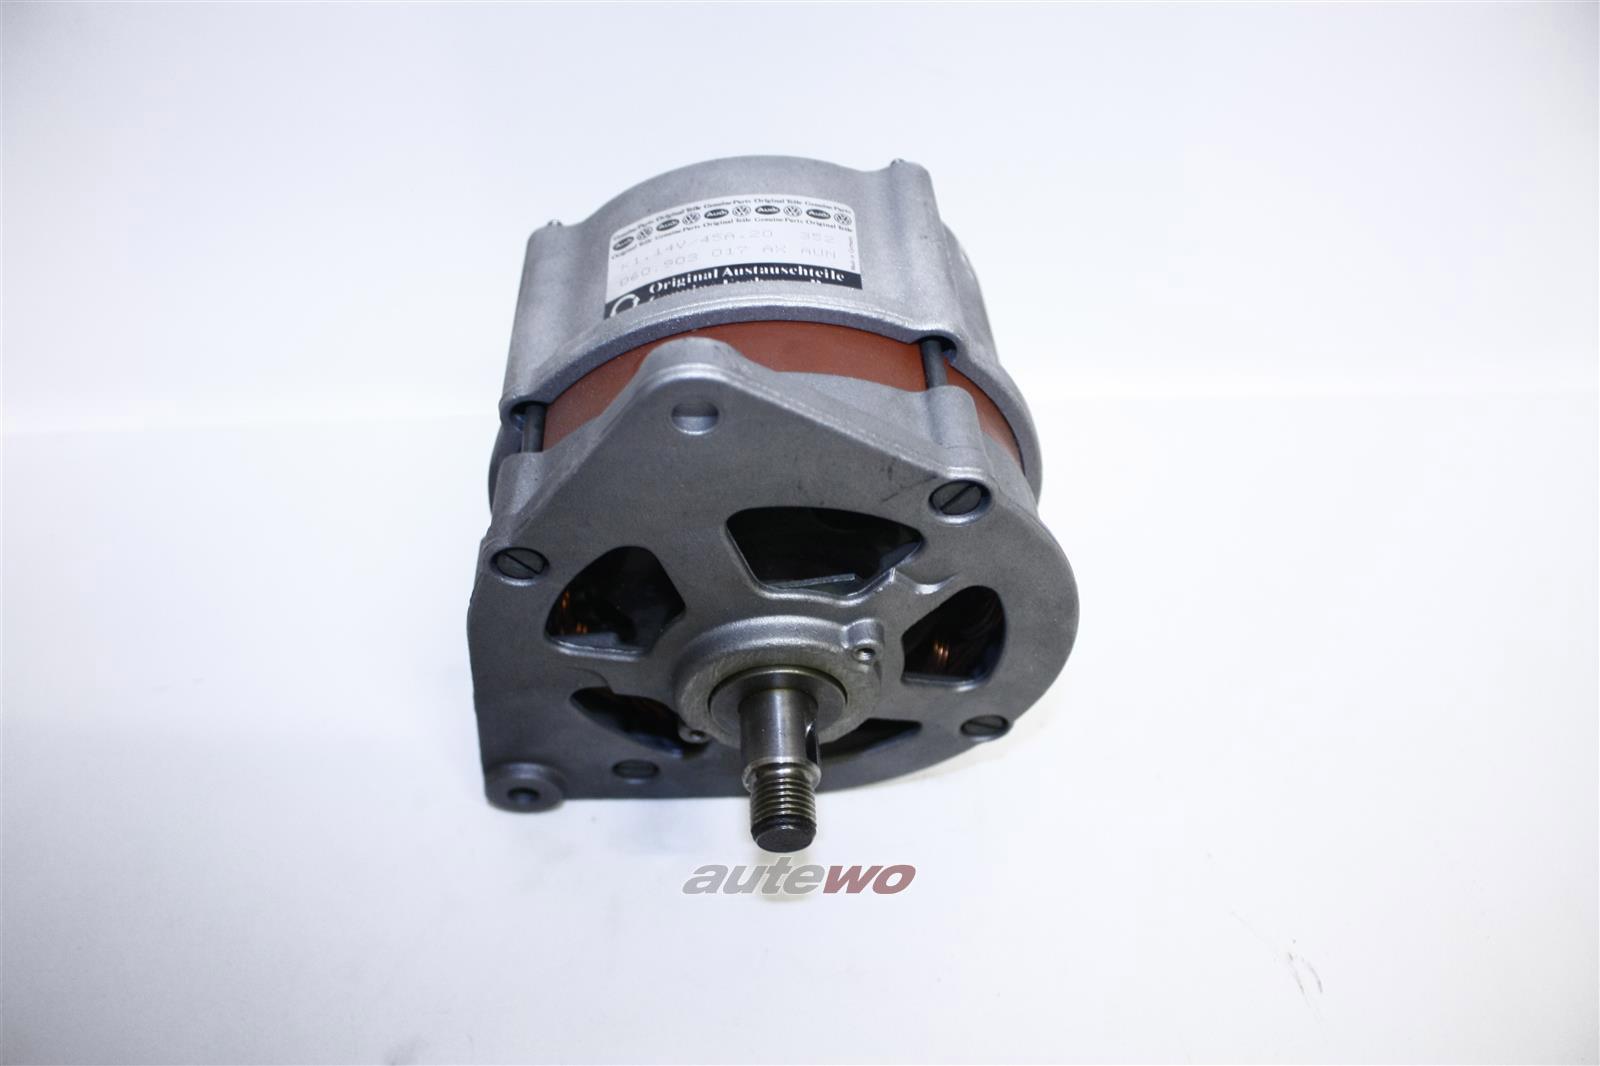 060903017AX Audi/VW 80 Typ 82/100 Typ 43/Passat 32B/Golf/Jetta 4 Zylinder Lichtmaschine 45A neu